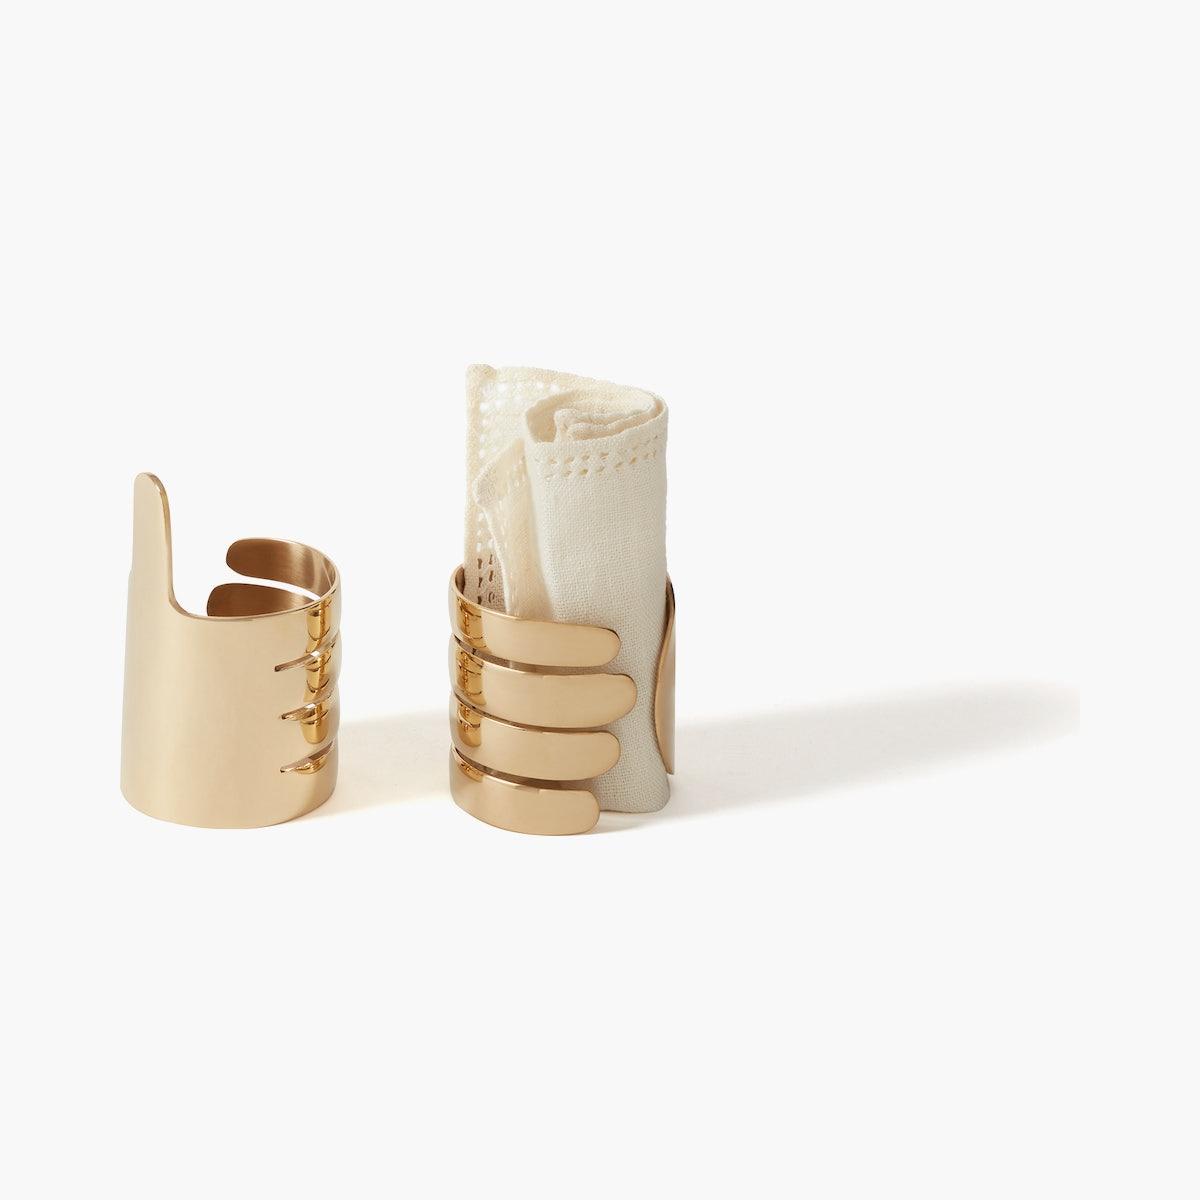 Handi Napkin Ring, Set of 2